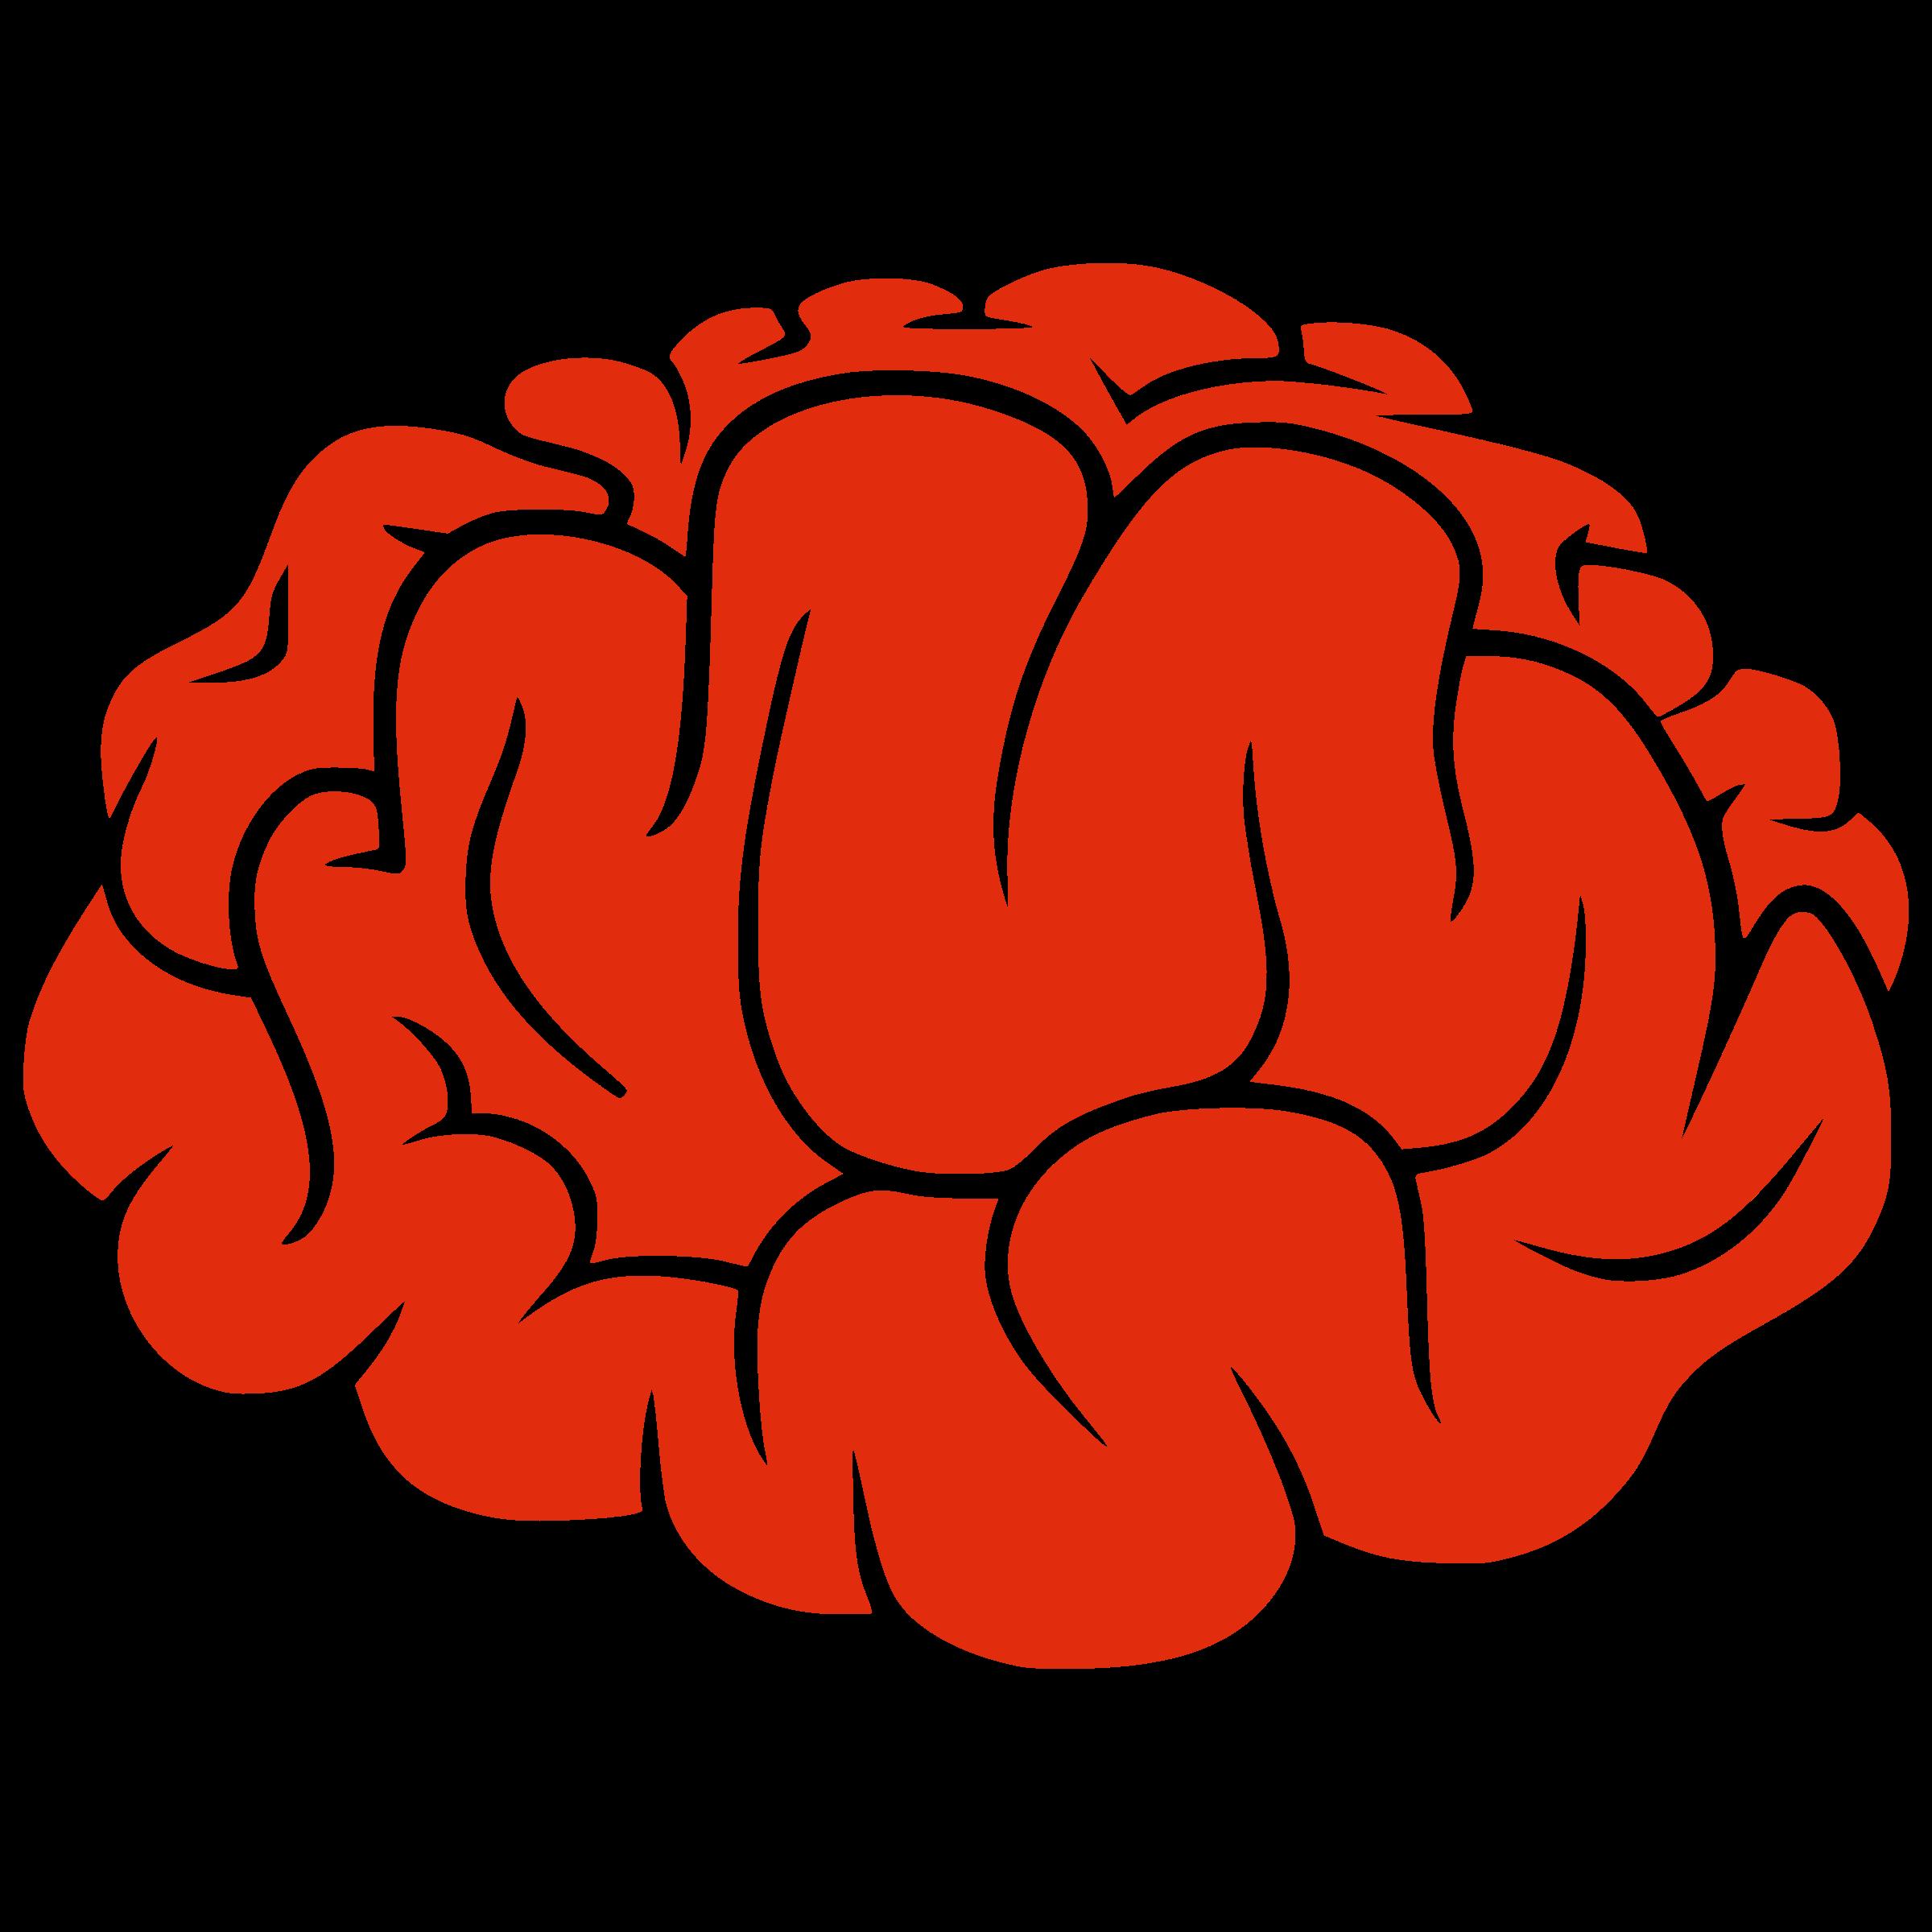 png logo pinterest. Idea clipart brain